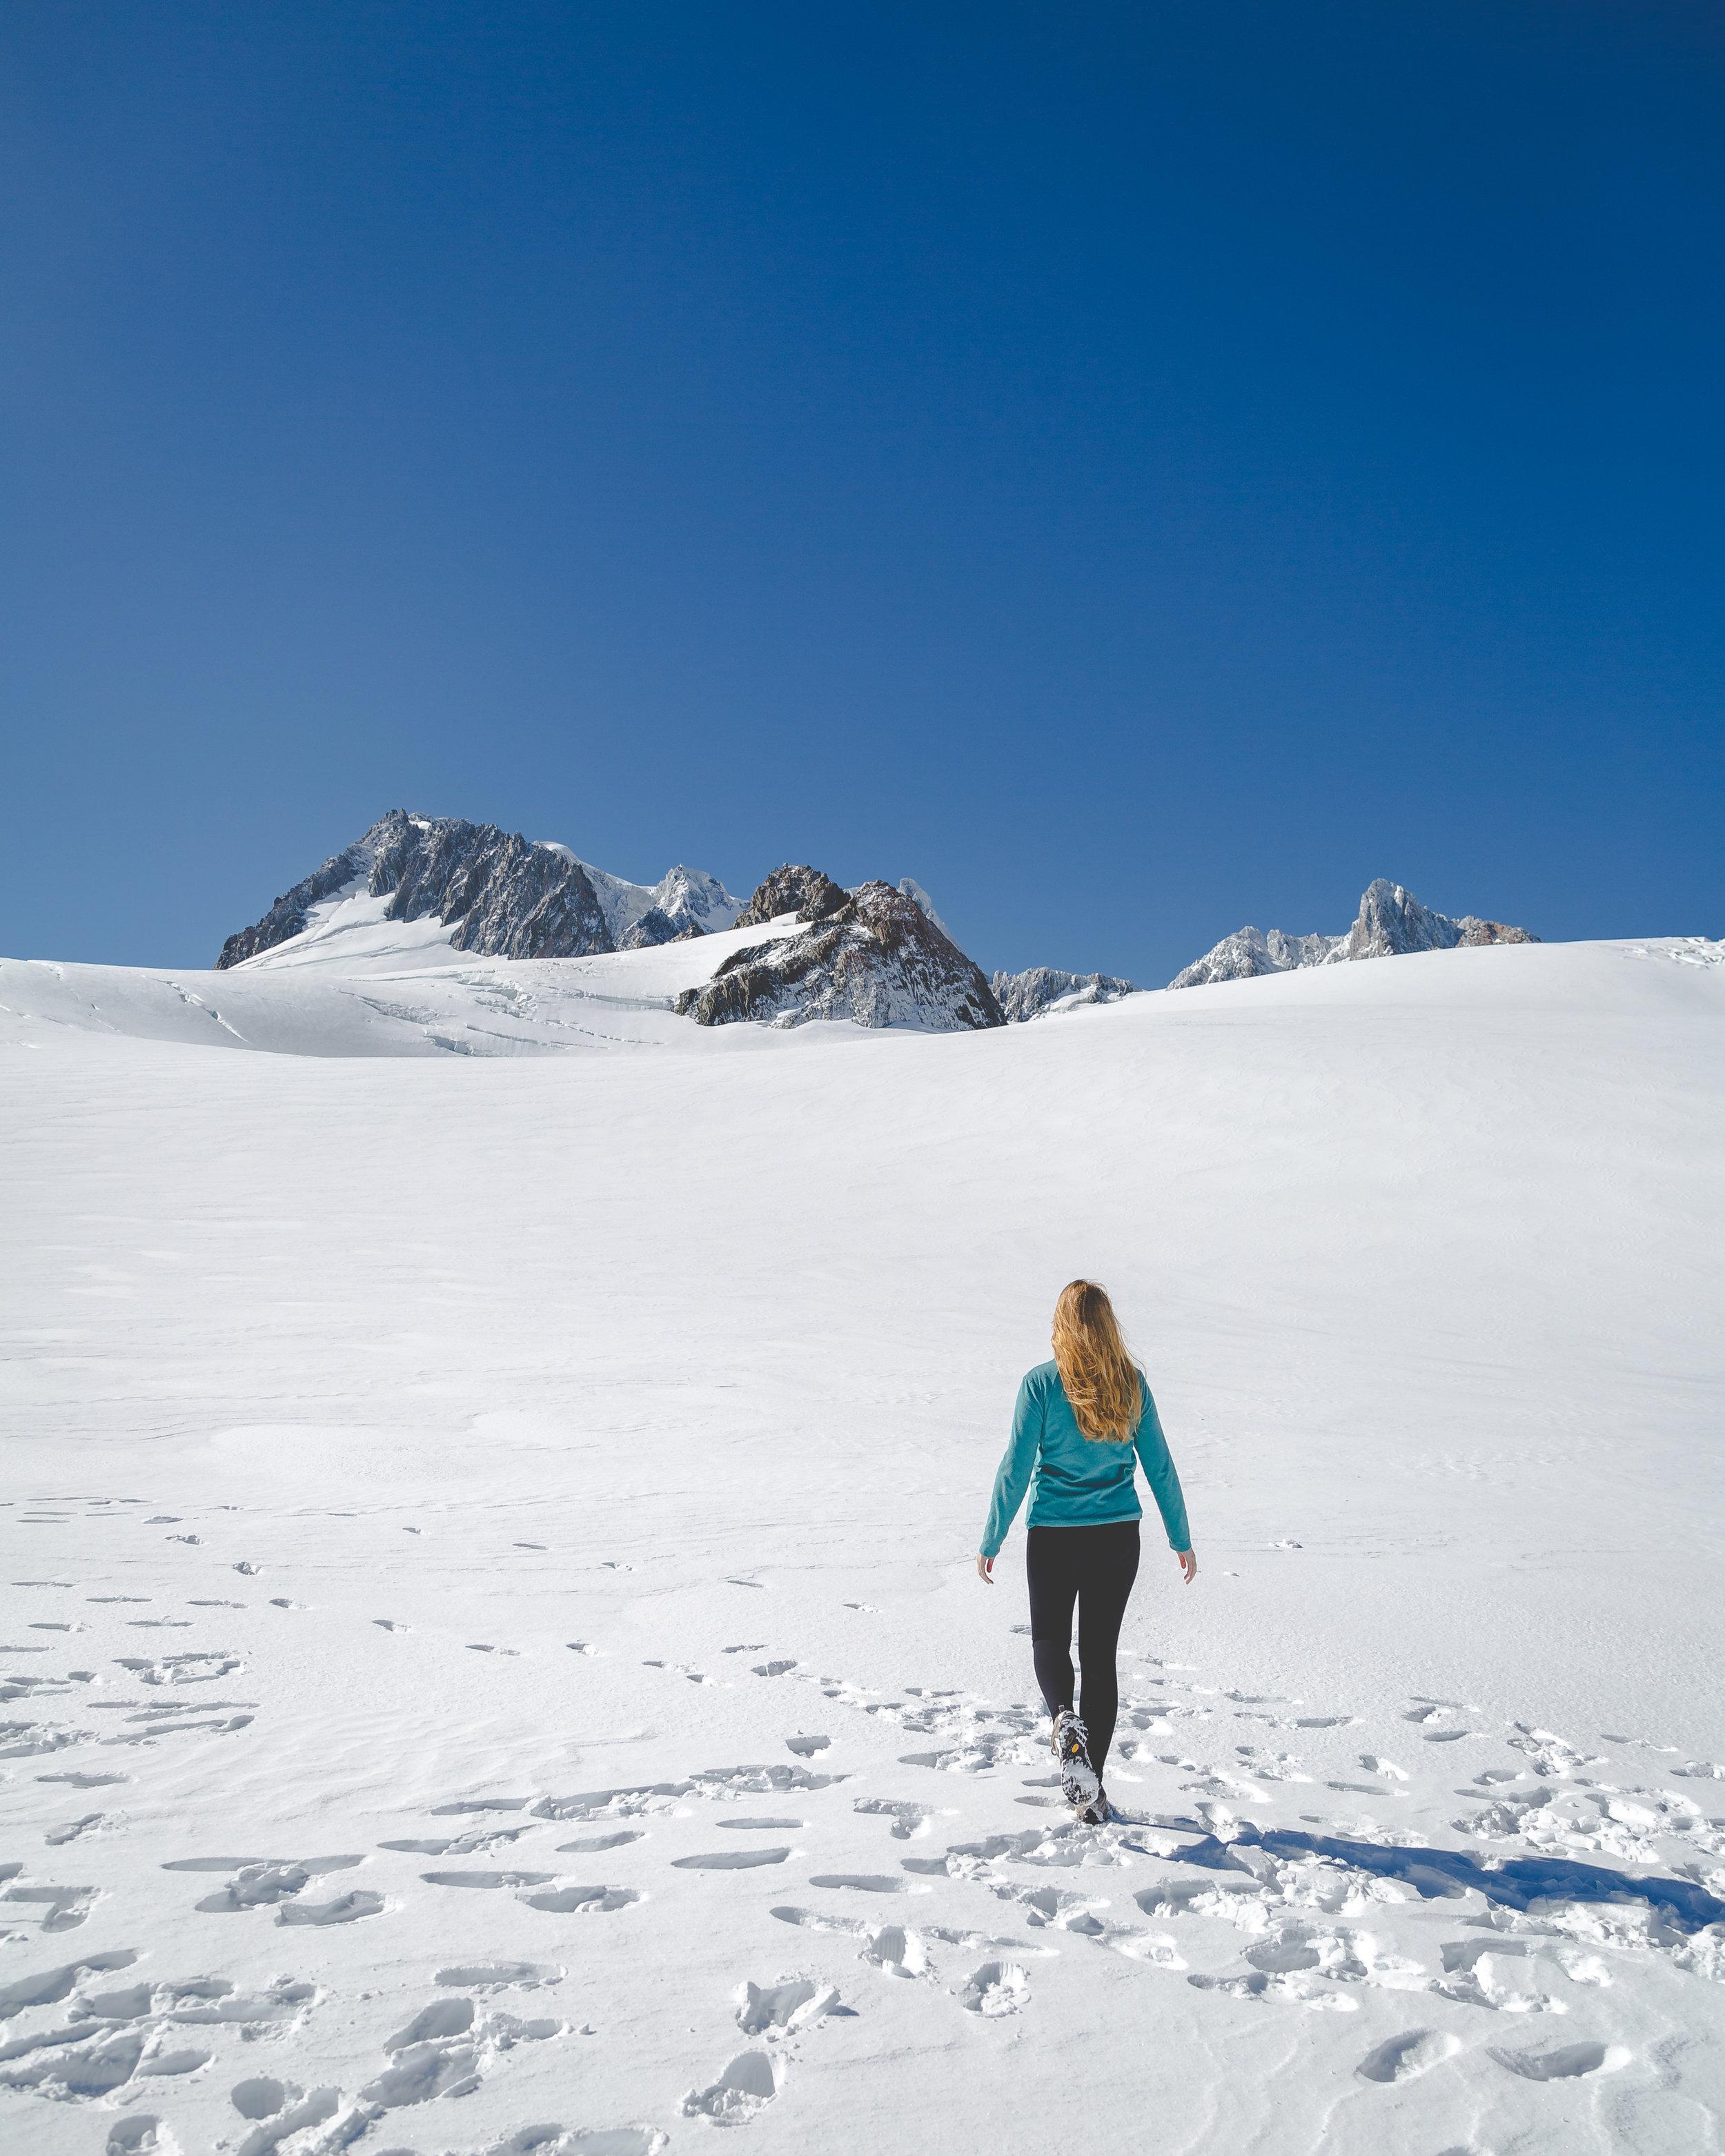 Instagrammable spots of New Zealand: Franz Josef Glacier